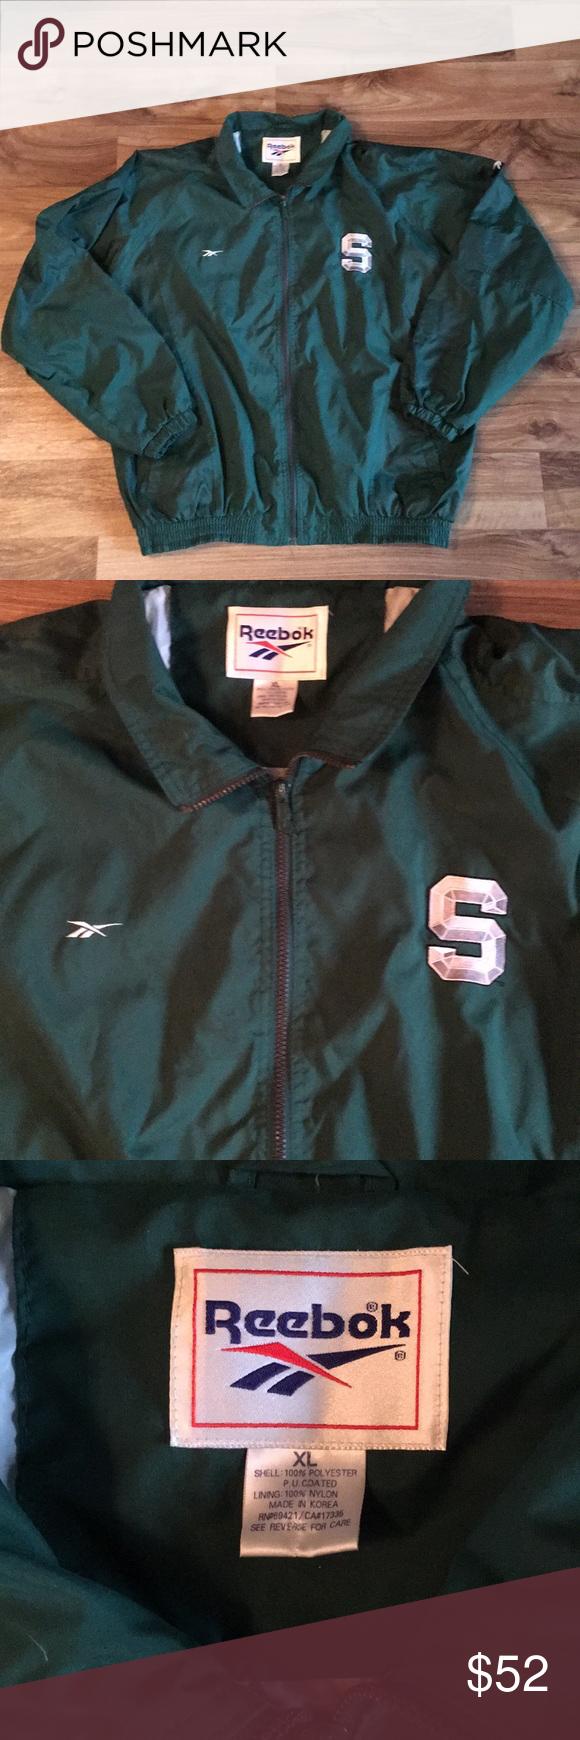 Vintage Reebok Michigan State Jacket Super Rad Vtg Msu Spartans Jacket From Reebok Men S Xl No Tears Or Stains Reebok Ja Vintage Reebok Reebok Clothes Design [ 1740 x 580 Pixel ]